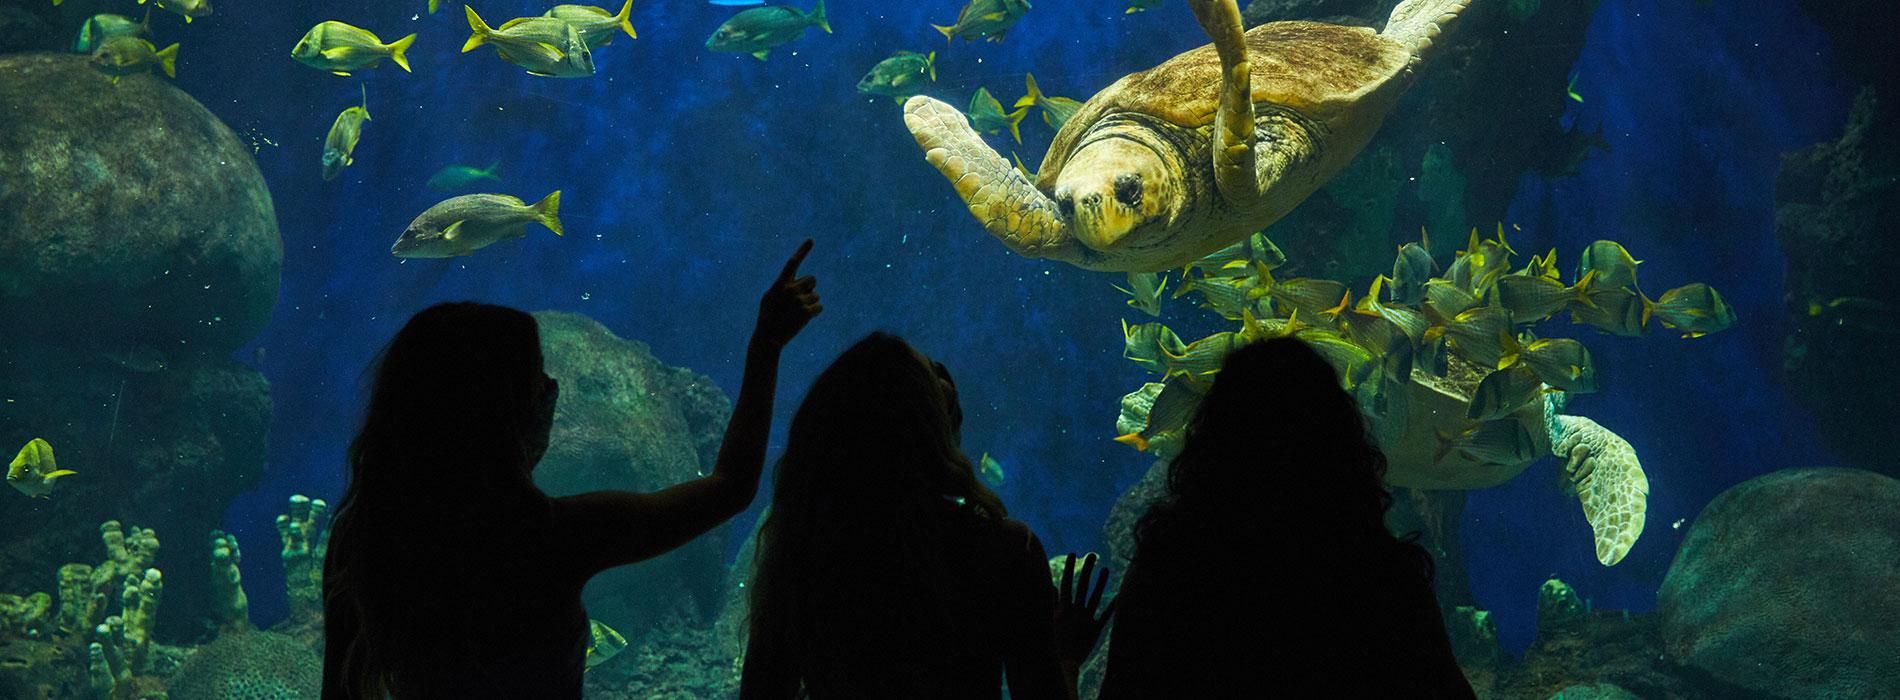 Green Sea Turtles SeaWorld San Diego